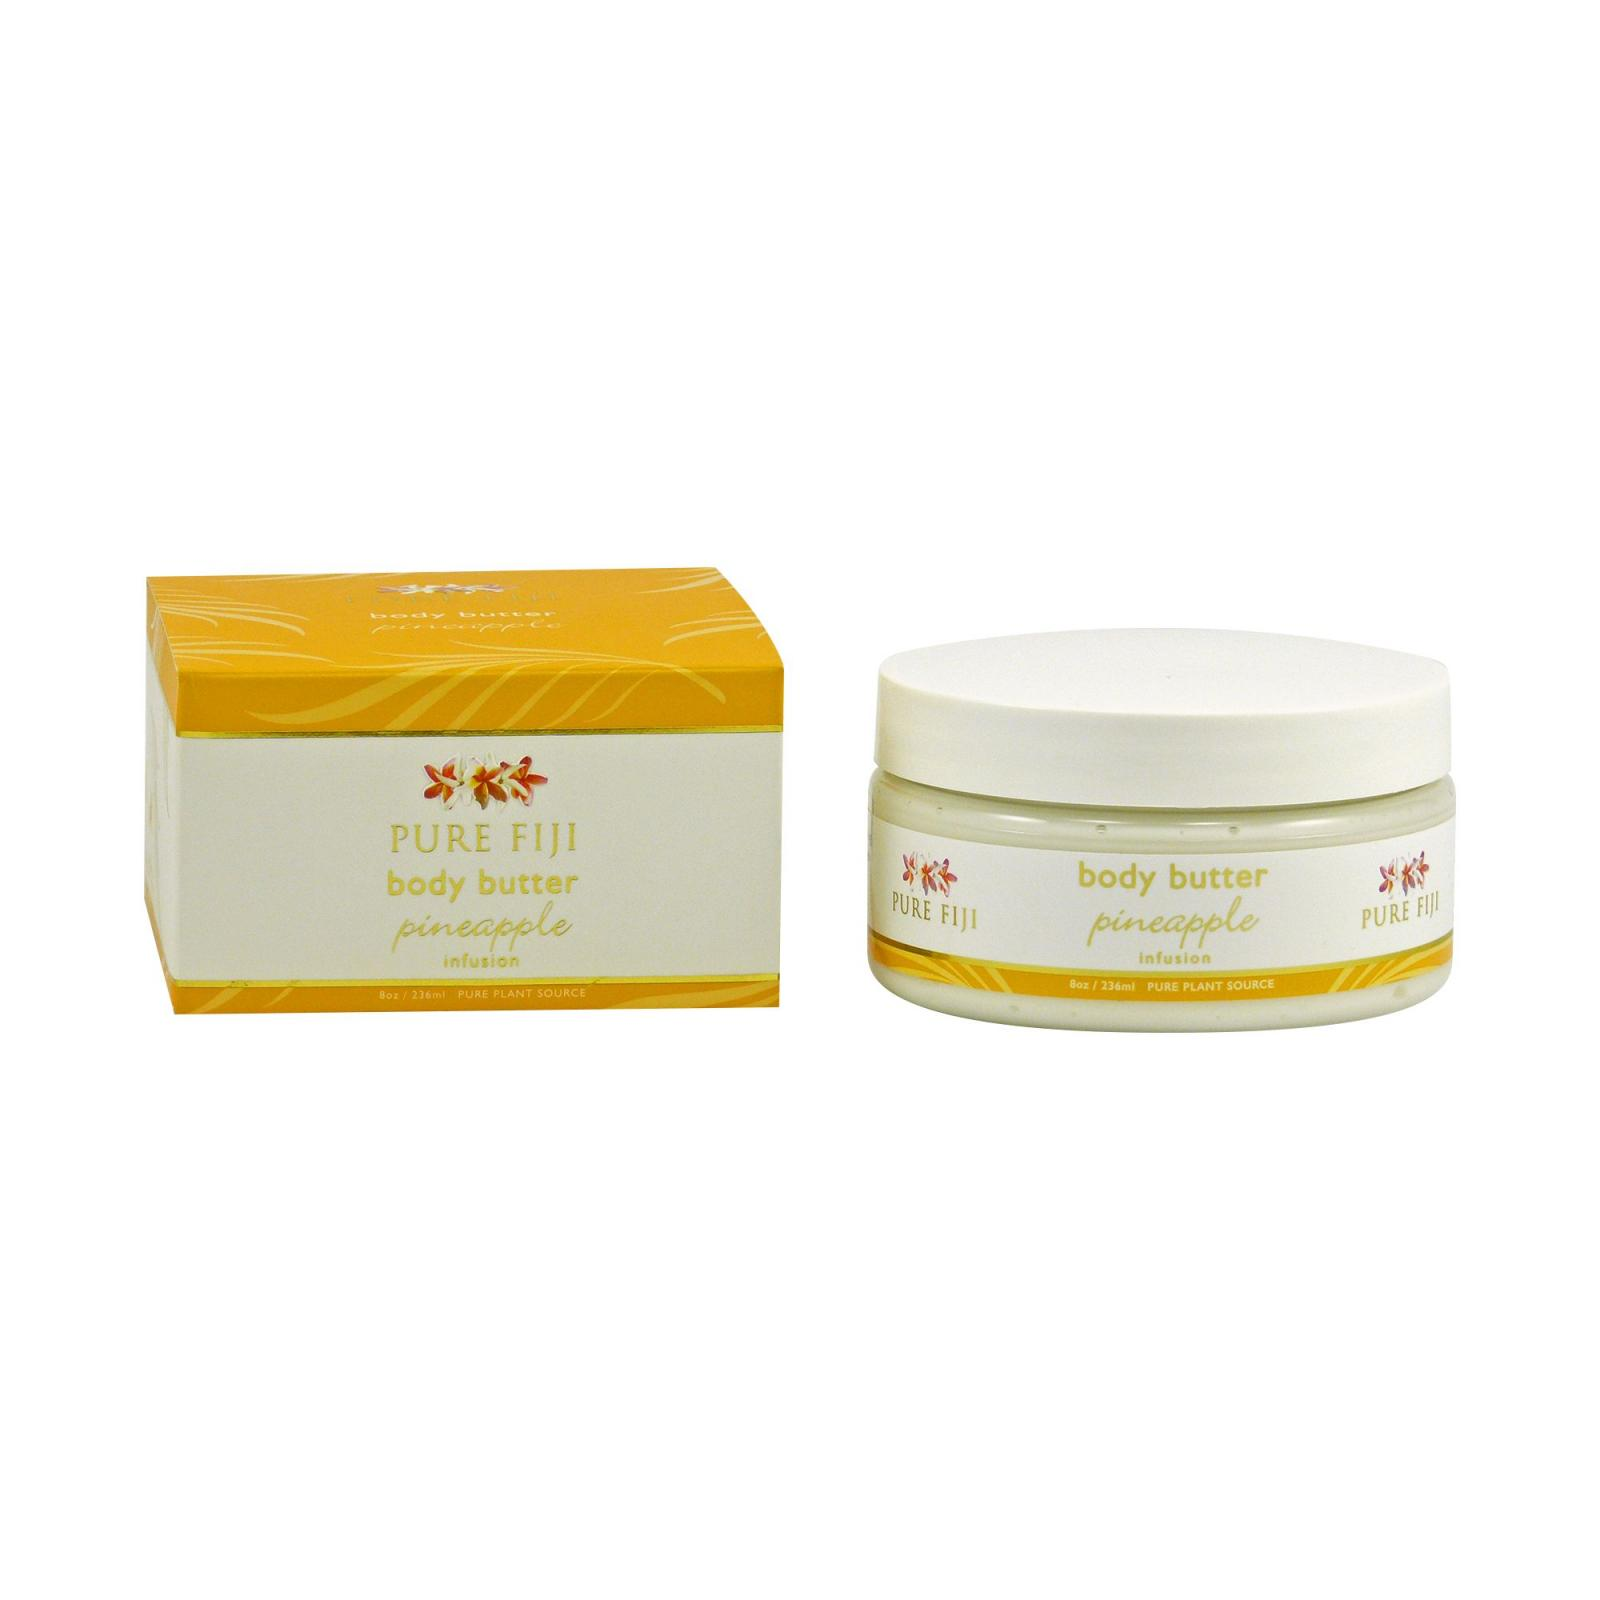 Pure Fiji Tělové máslo, ananas 236 ml